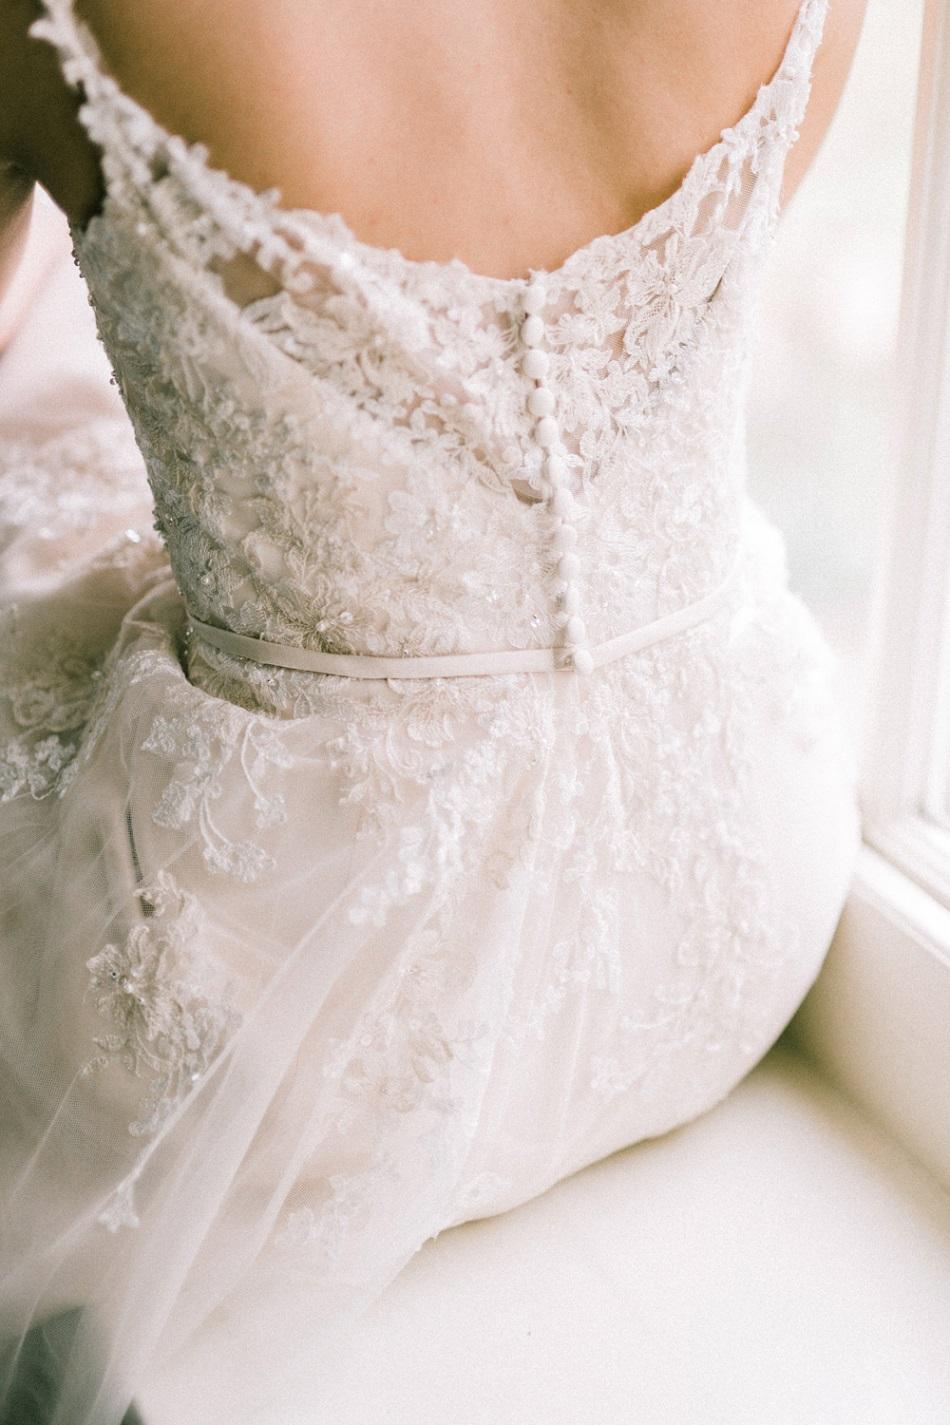 Achterkant van bruidsjurk